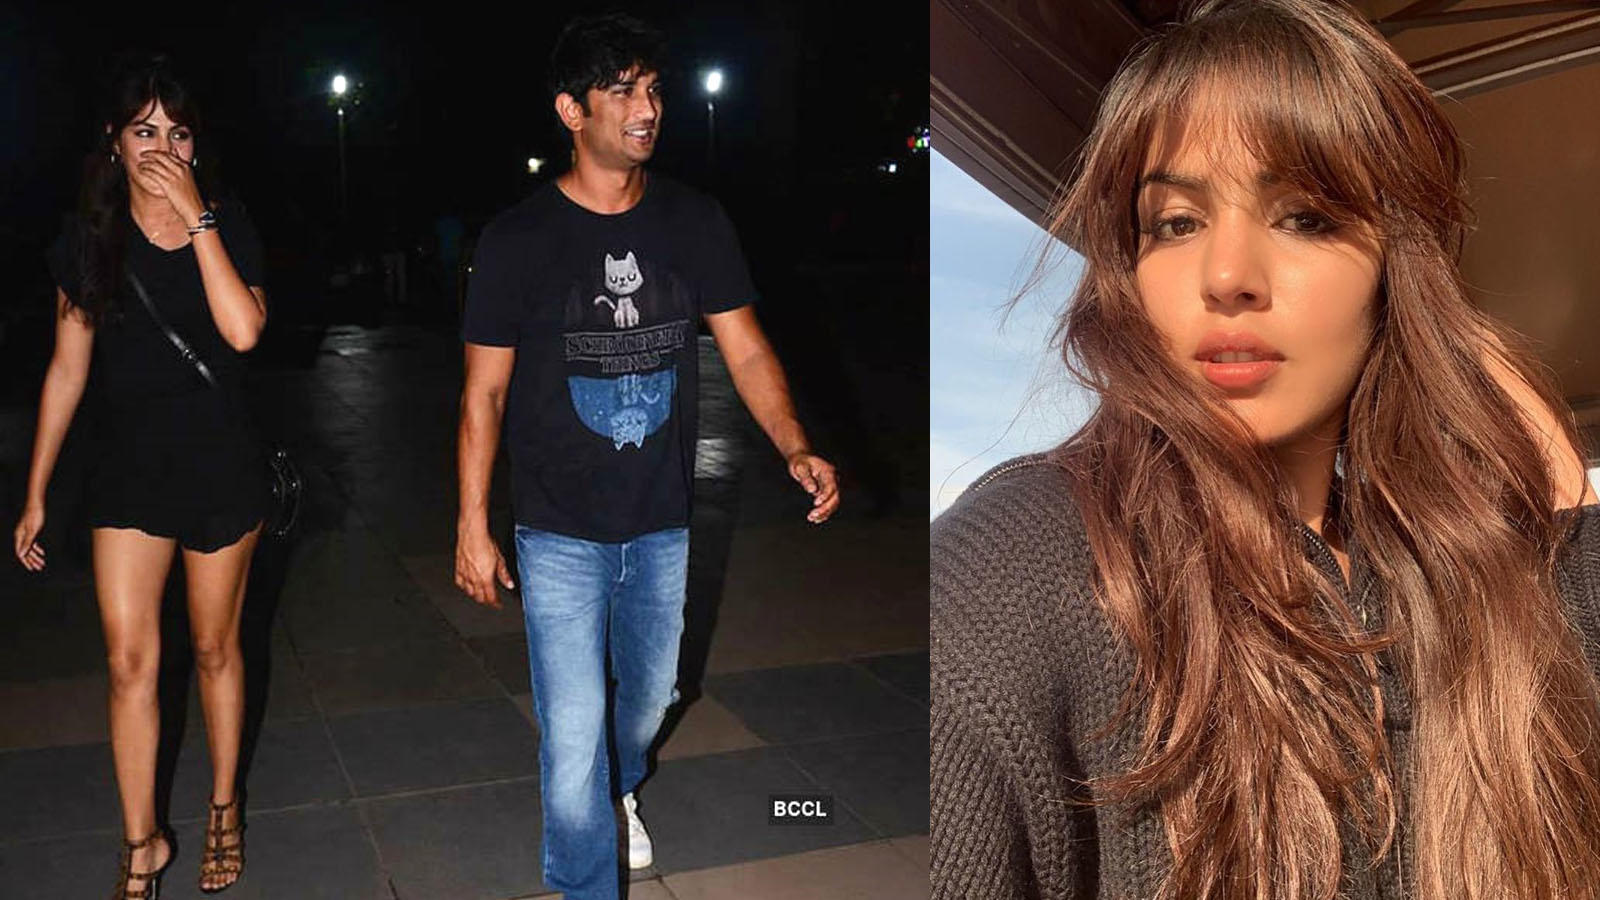 Sushant Singh Rajput leaves a poetic comment on rumoured lady love Rhea Chakraborty's latest sun-kissed selfie